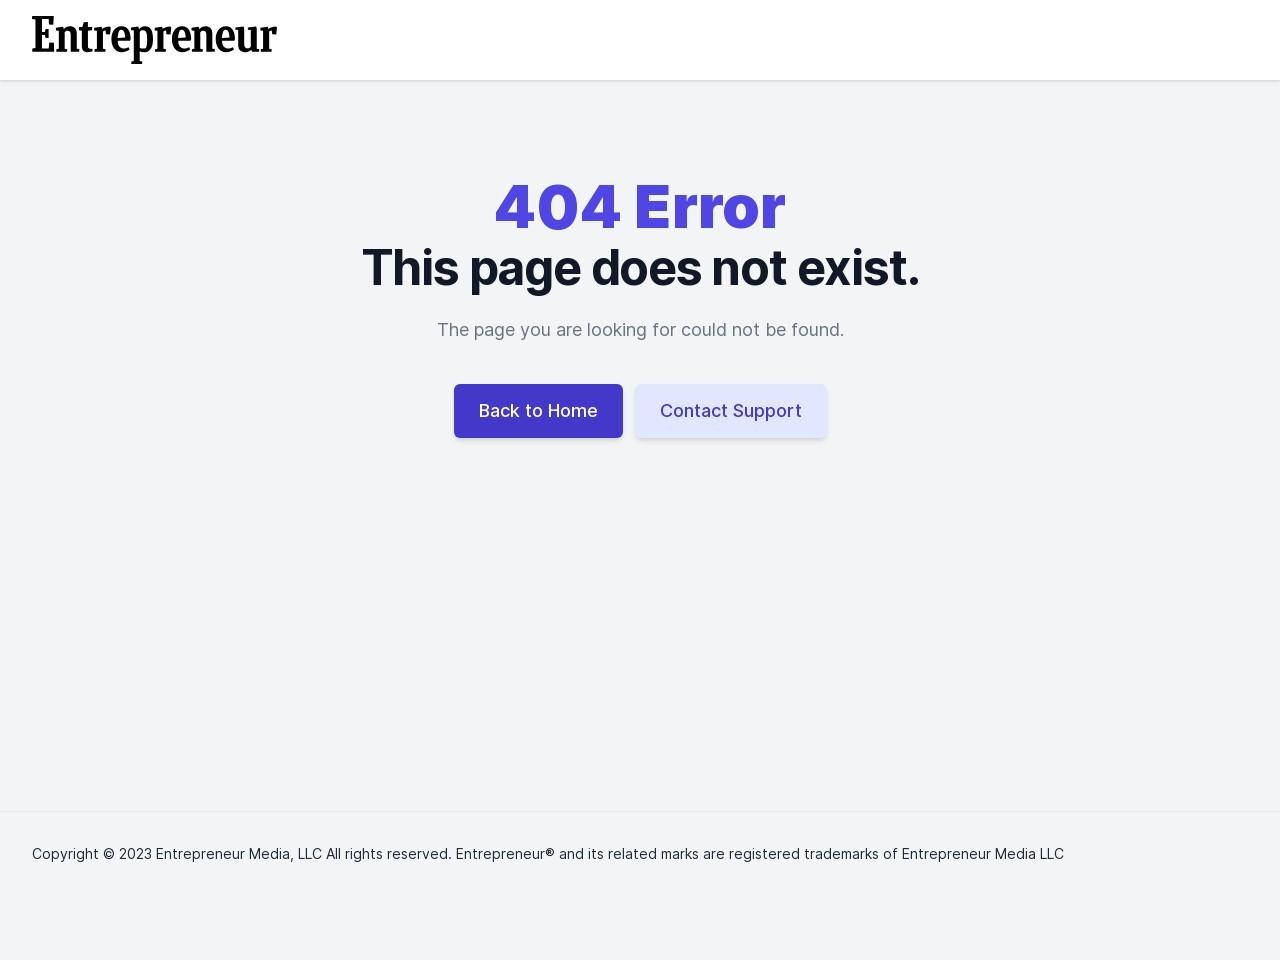 Free On-Demand Webinar: Winning Strategies to Drive Product Innovation & Growth